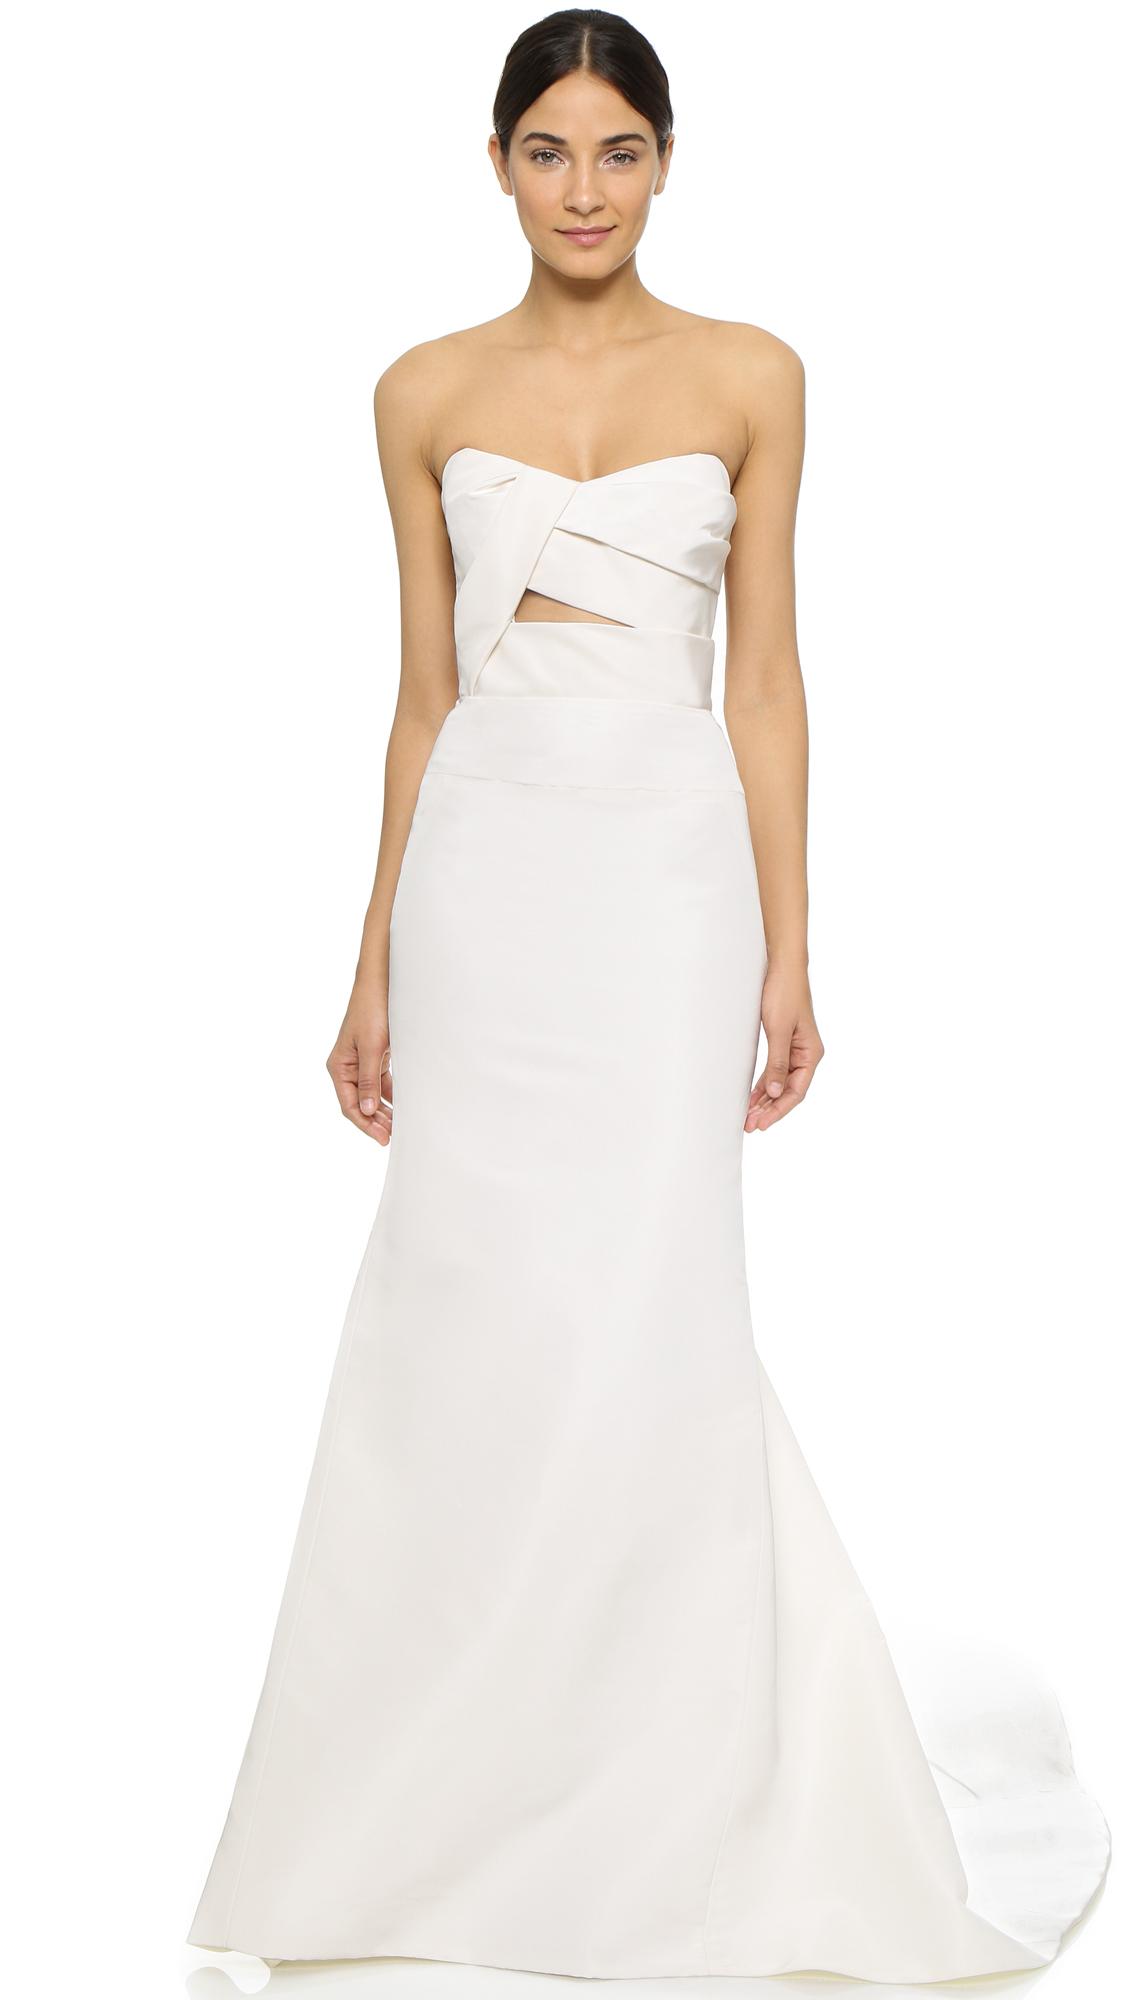 j mendel wedding dress J Mendel Adelaide Strapless Bustier Gown SHOPBOP Extra 25 Off Sale Styles Use Code SCORE17